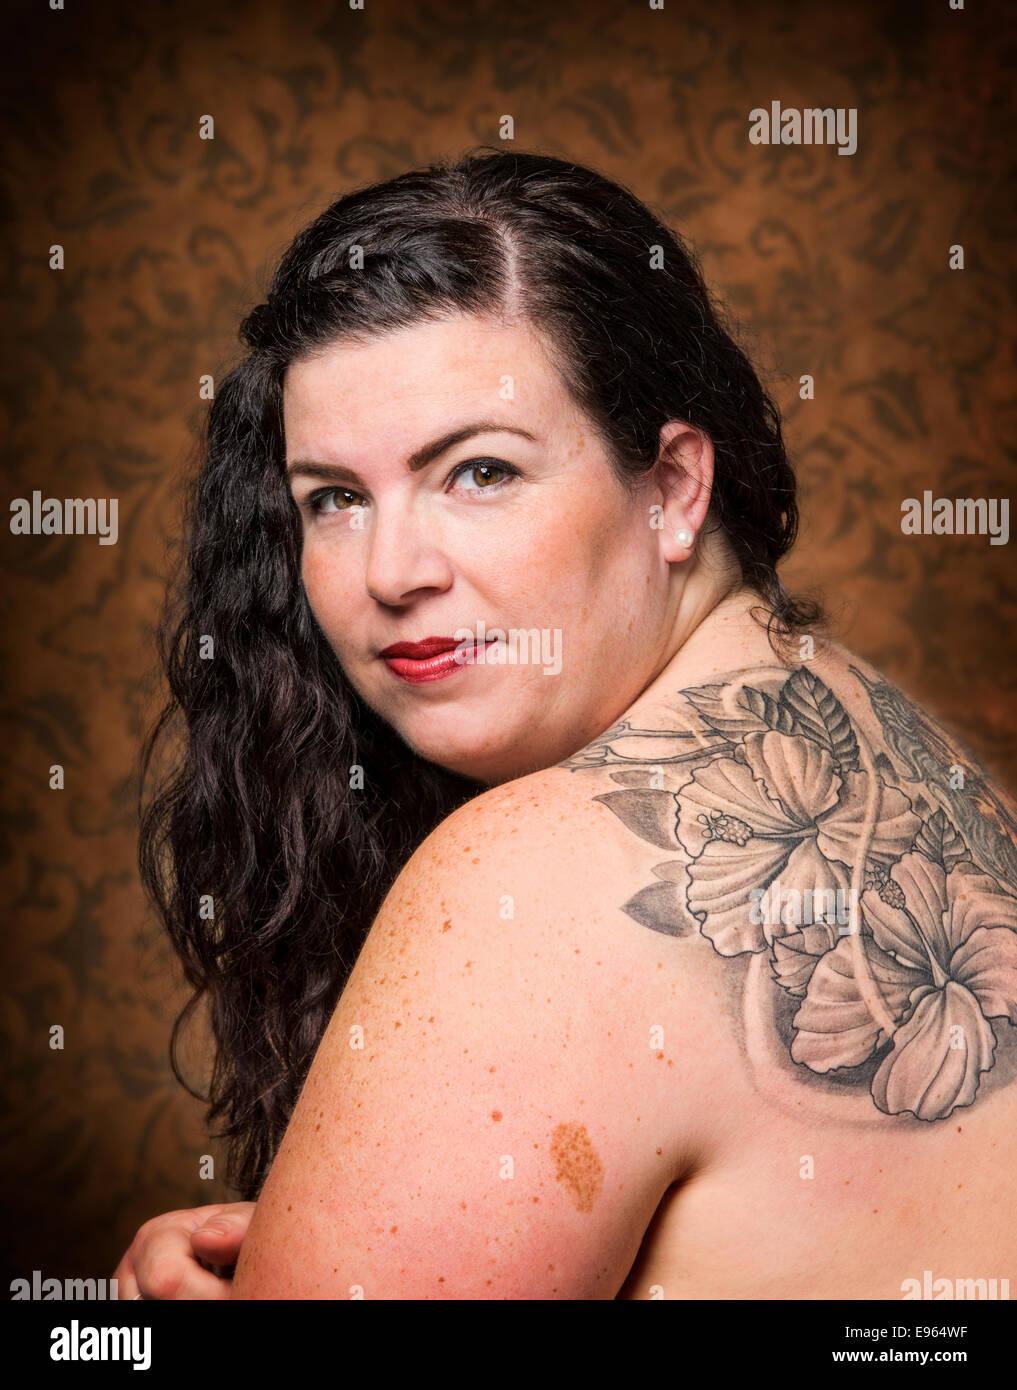 Fat nude girl portrait photo 972